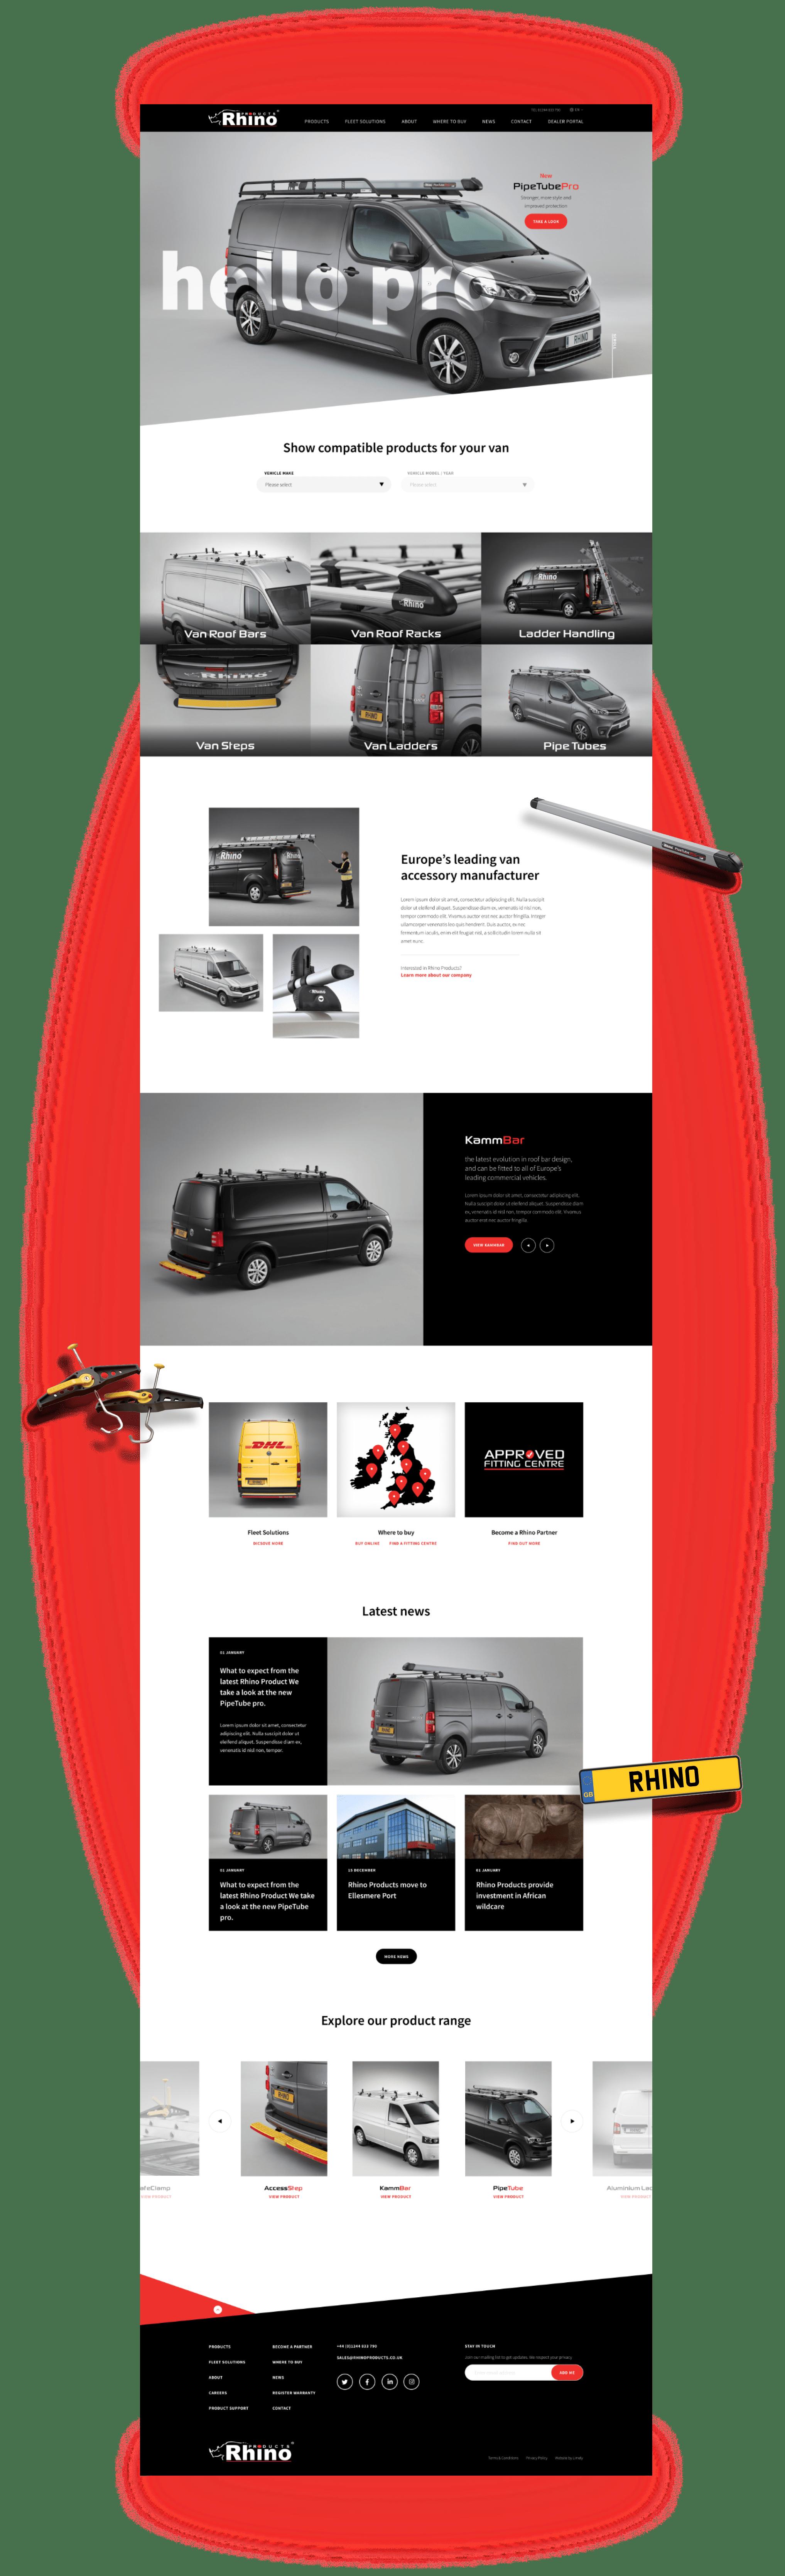 Rhino Products Homepage Full